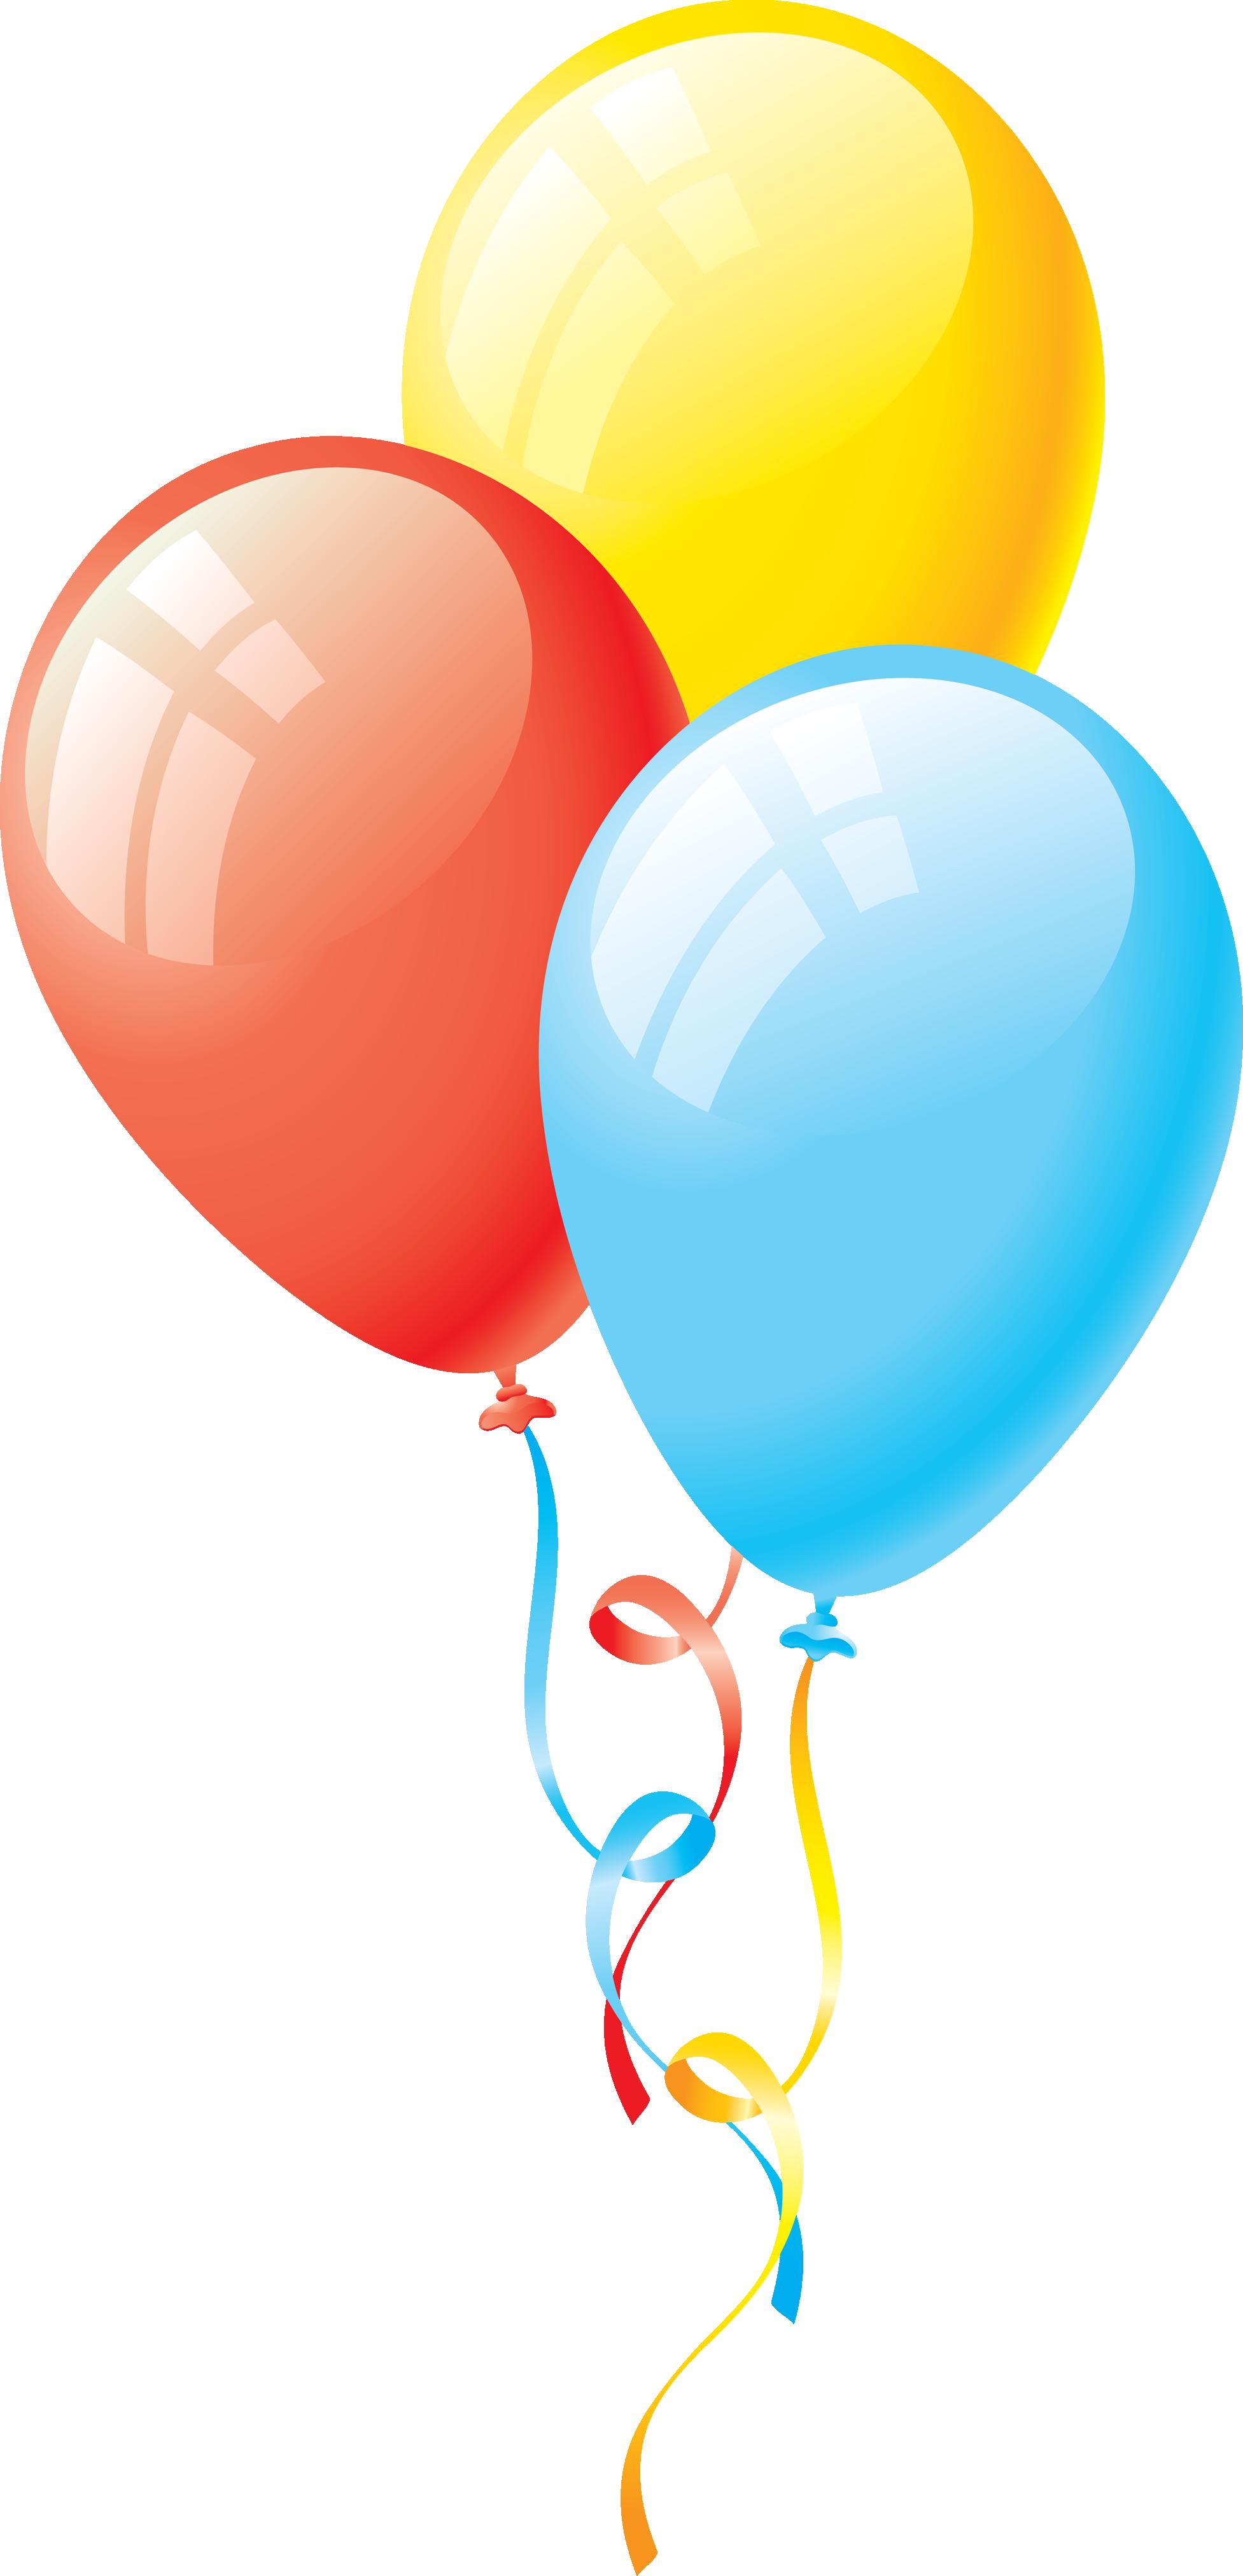 Balloon HD PNG - 91255